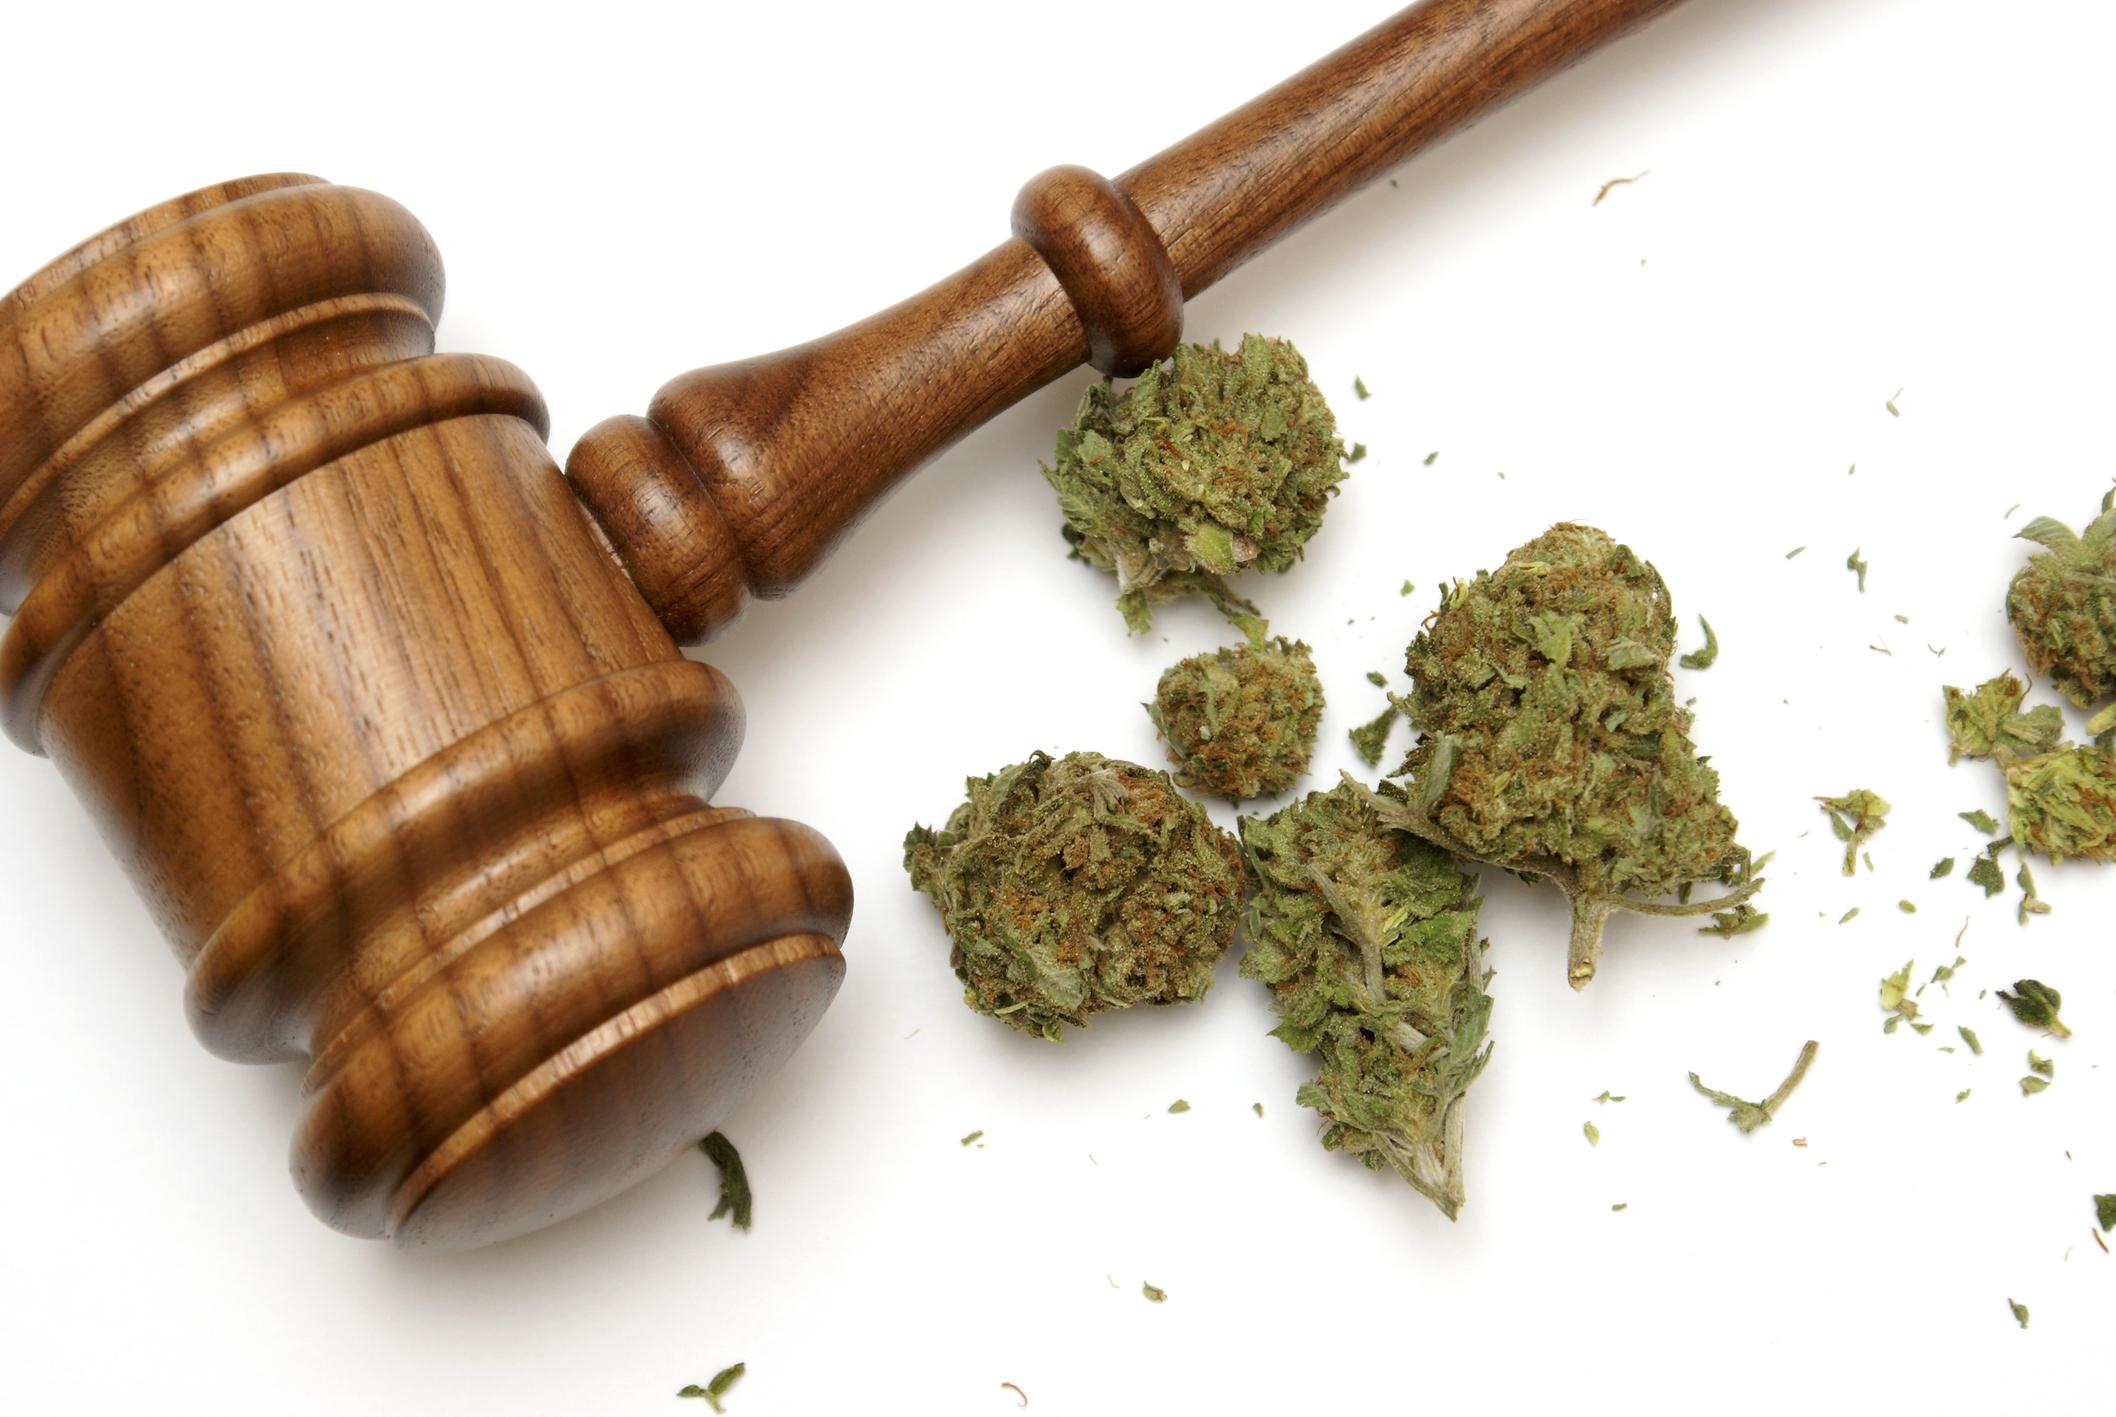 A wooden gavel resting next to marijuana buds.